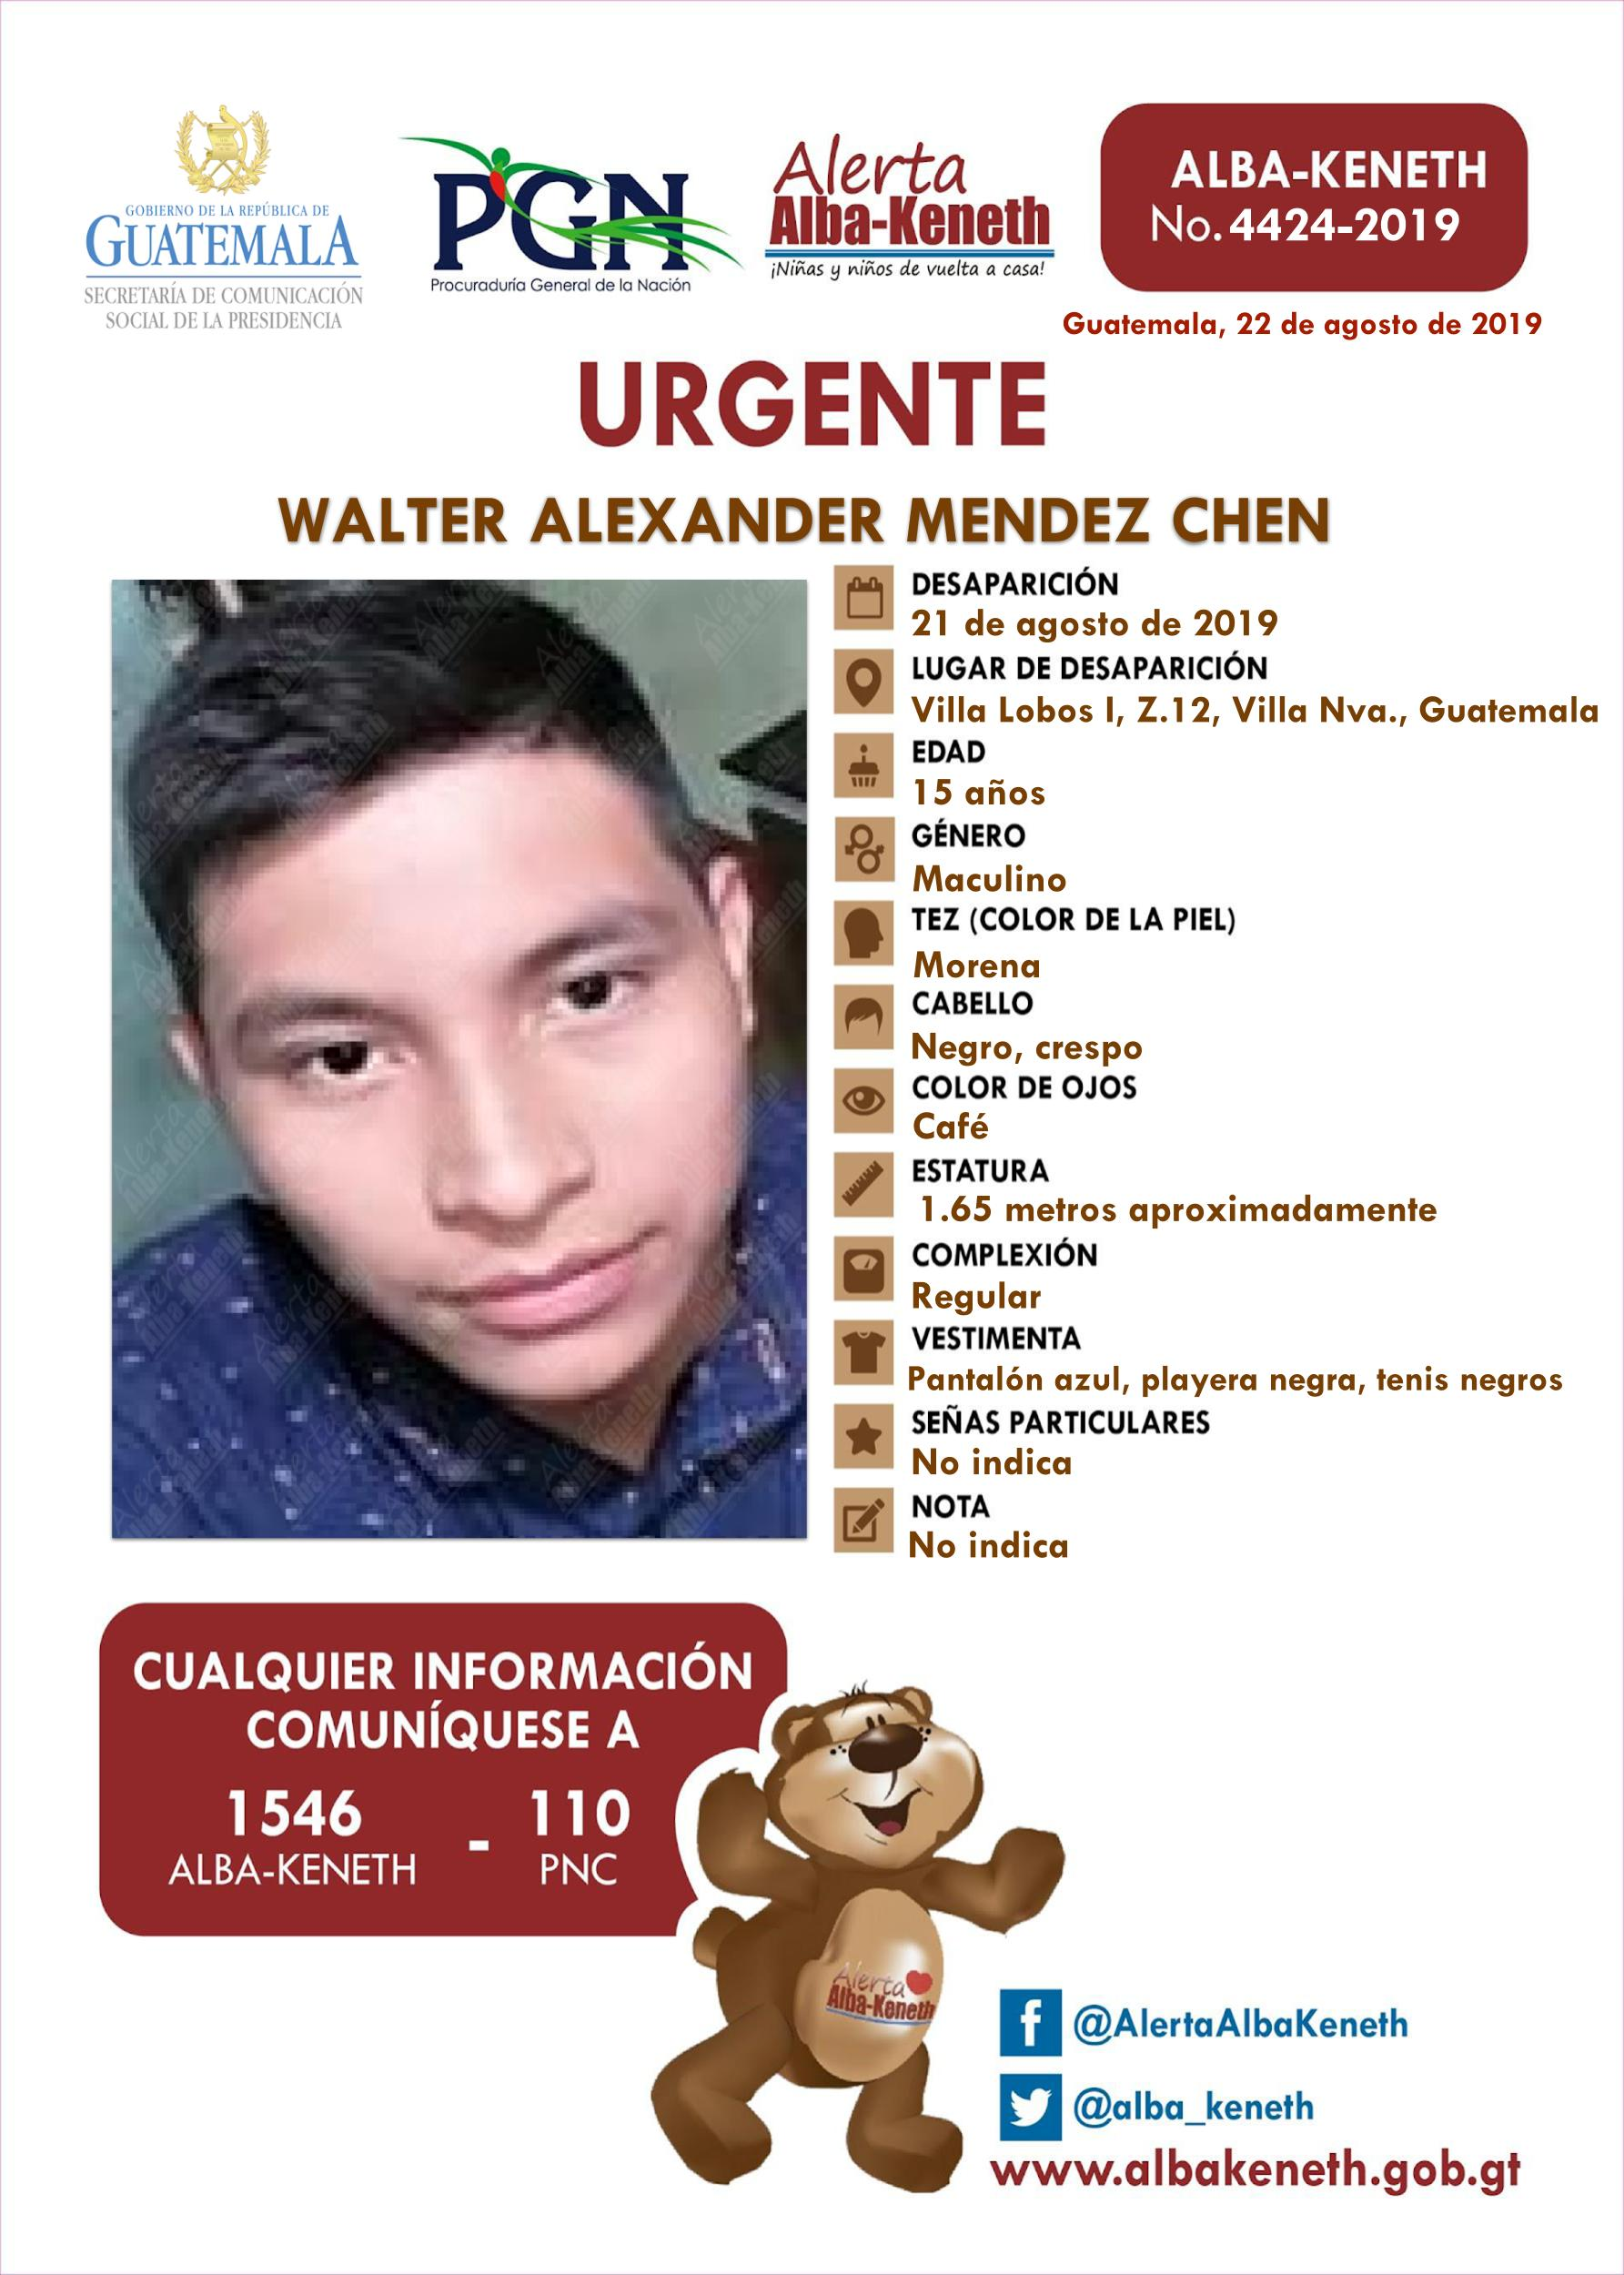 Walter Alexander Mendez Chen